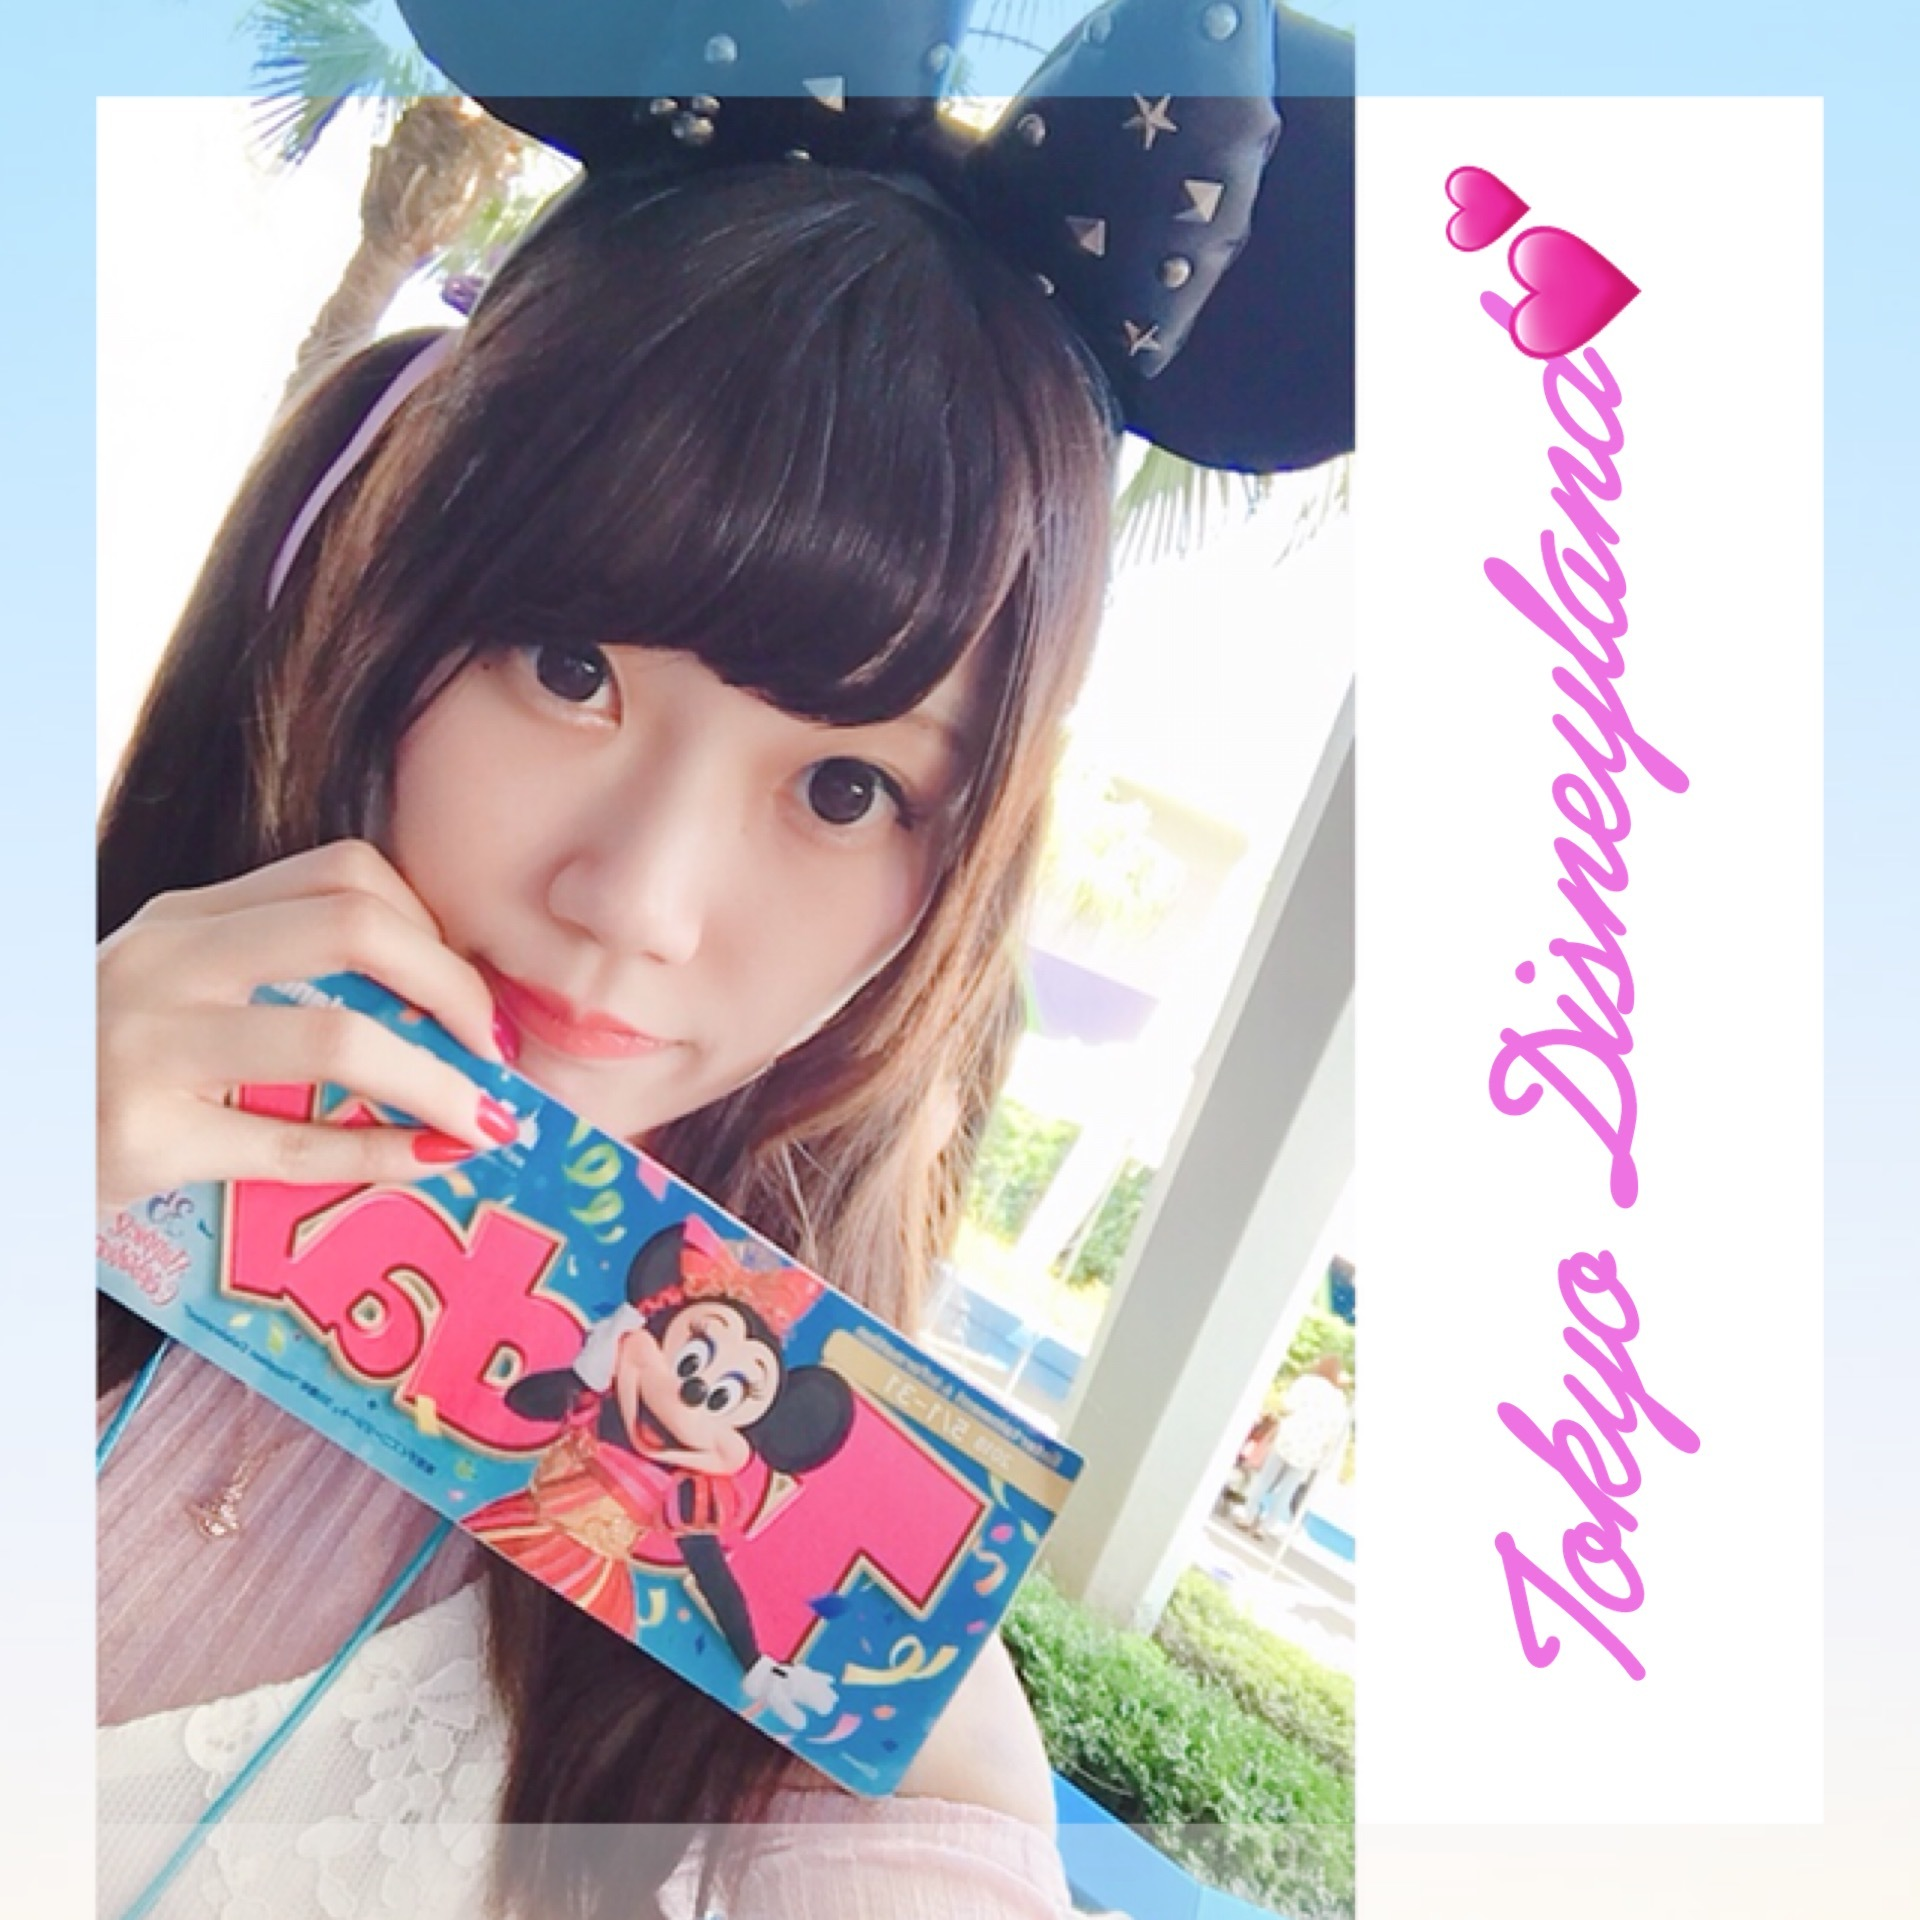 Tokyo Disneyland《 35 Happiest Gelebration! 》に行ってきました♫_1_1